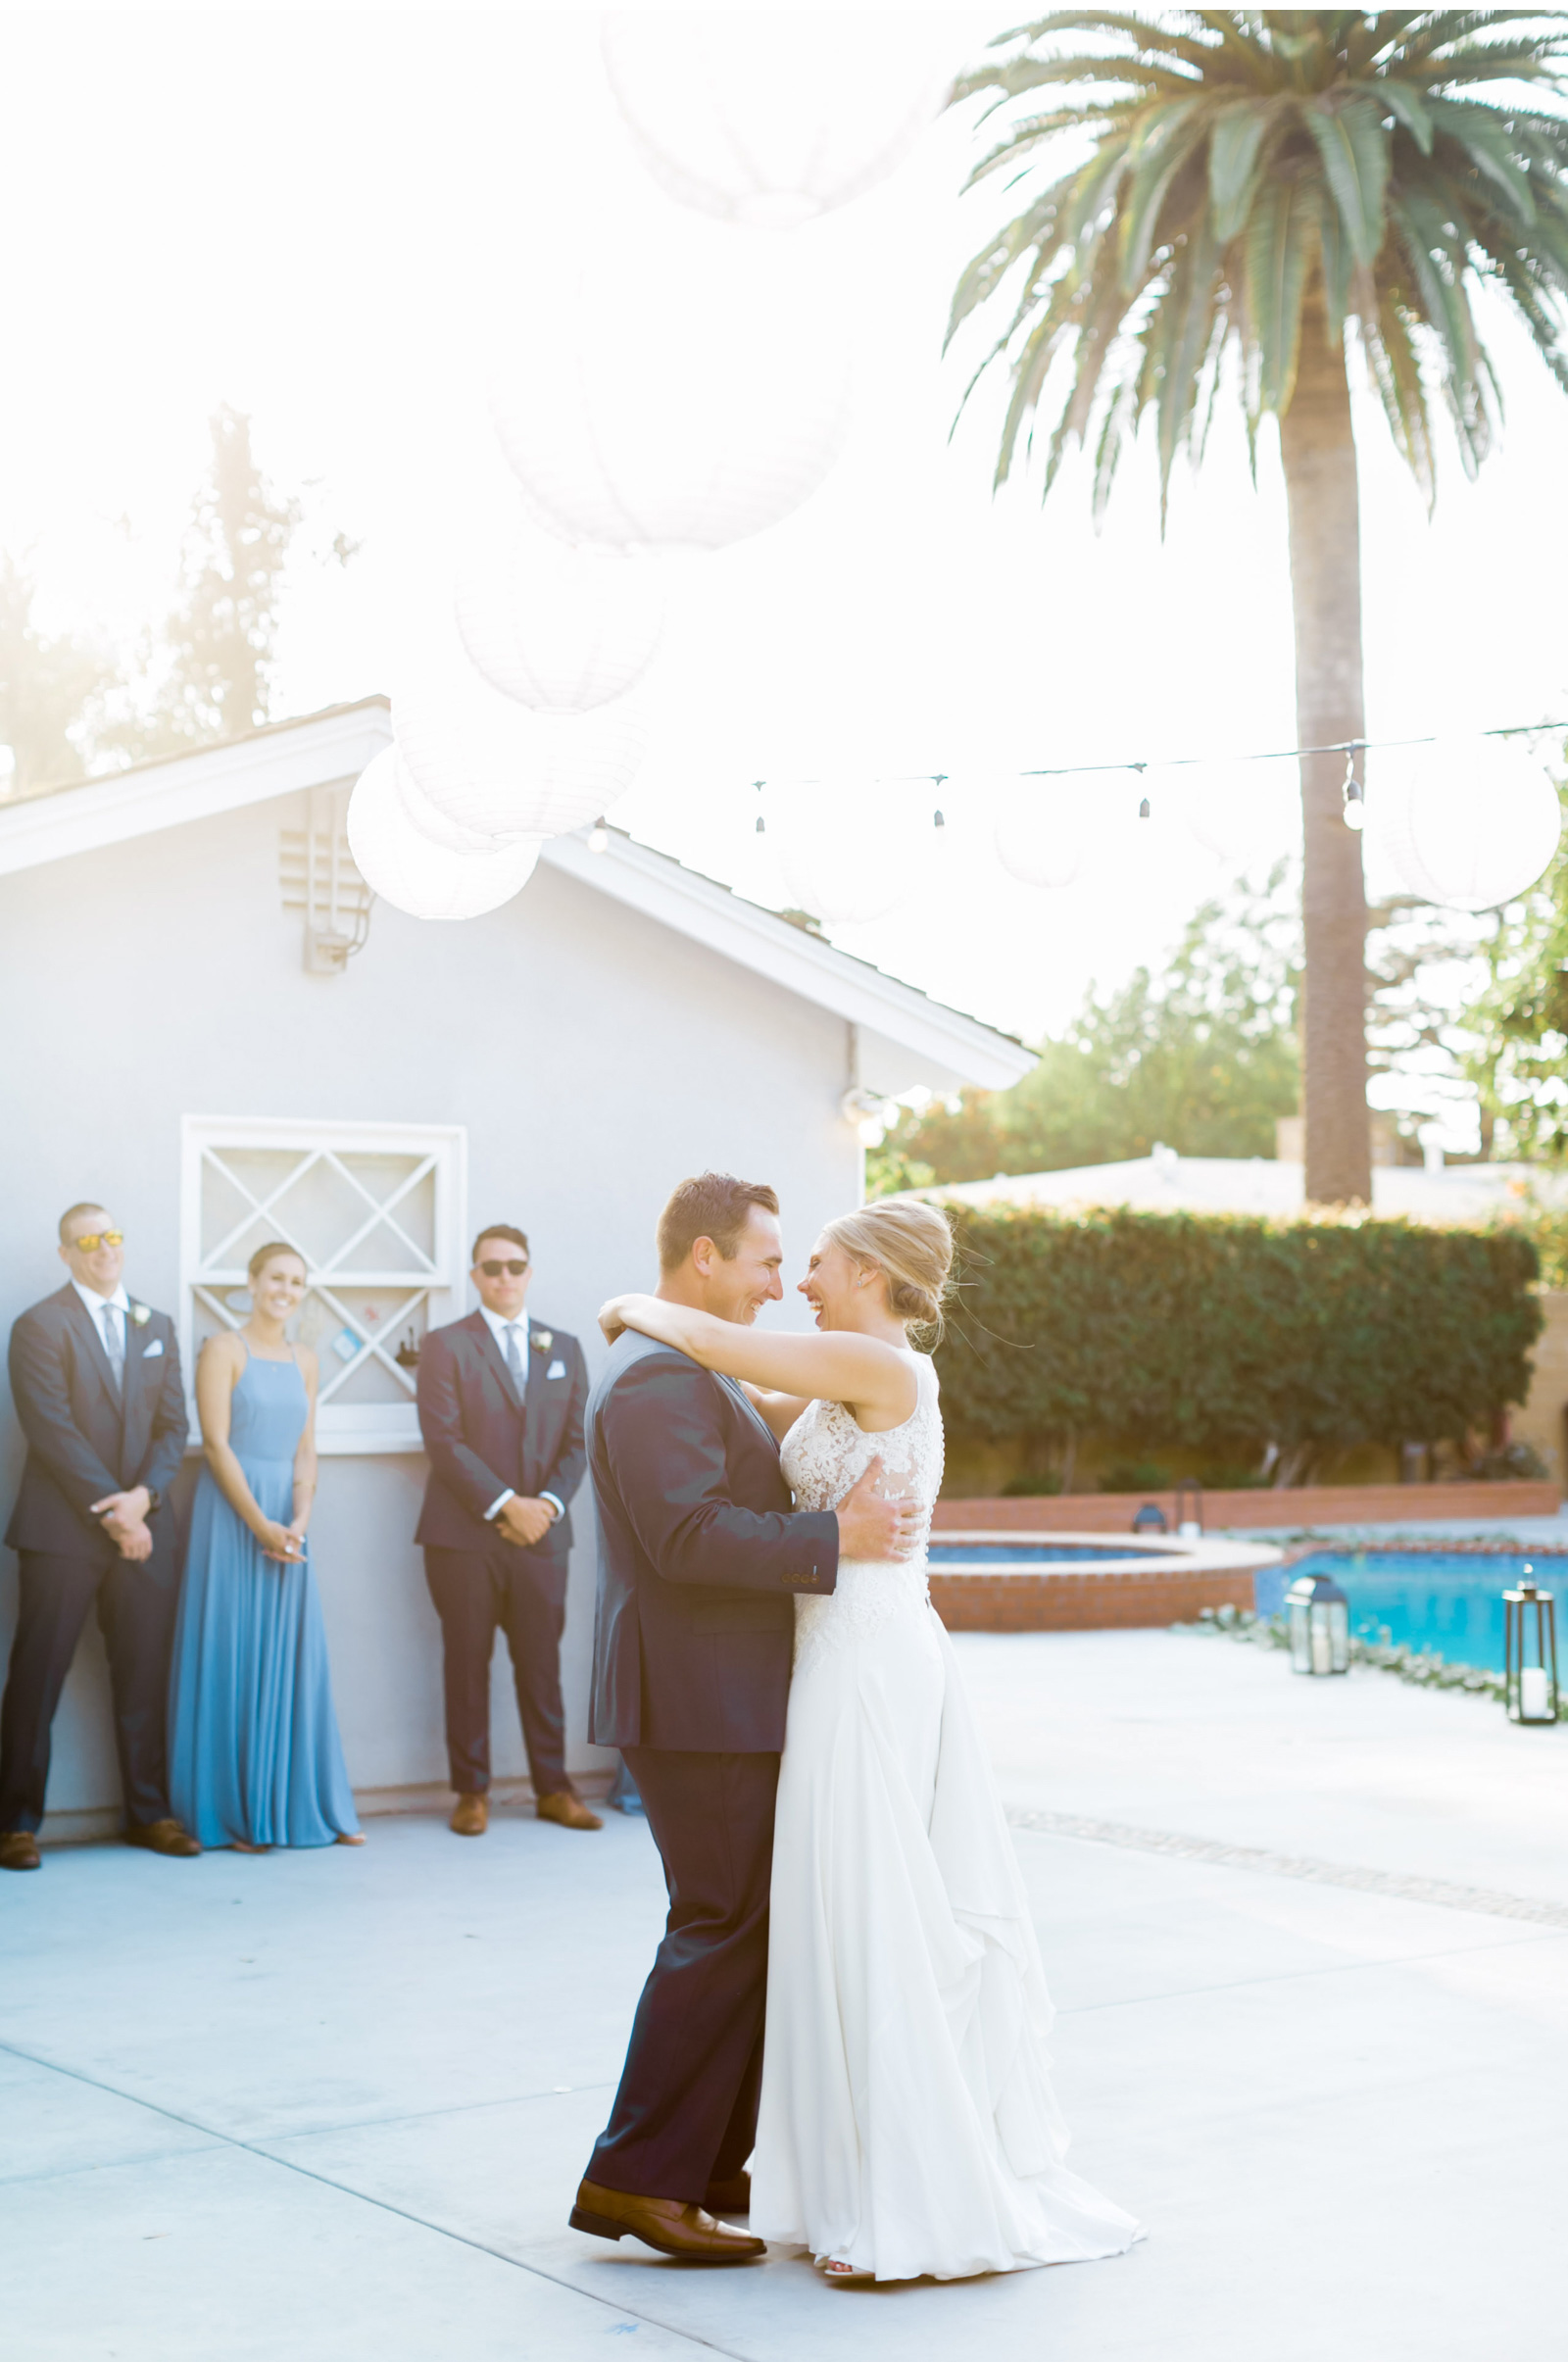 Malibu-Wedding-Photographer-Natalie-Schutt-Photography-Fine-Art-Film-Photography_10.jpg